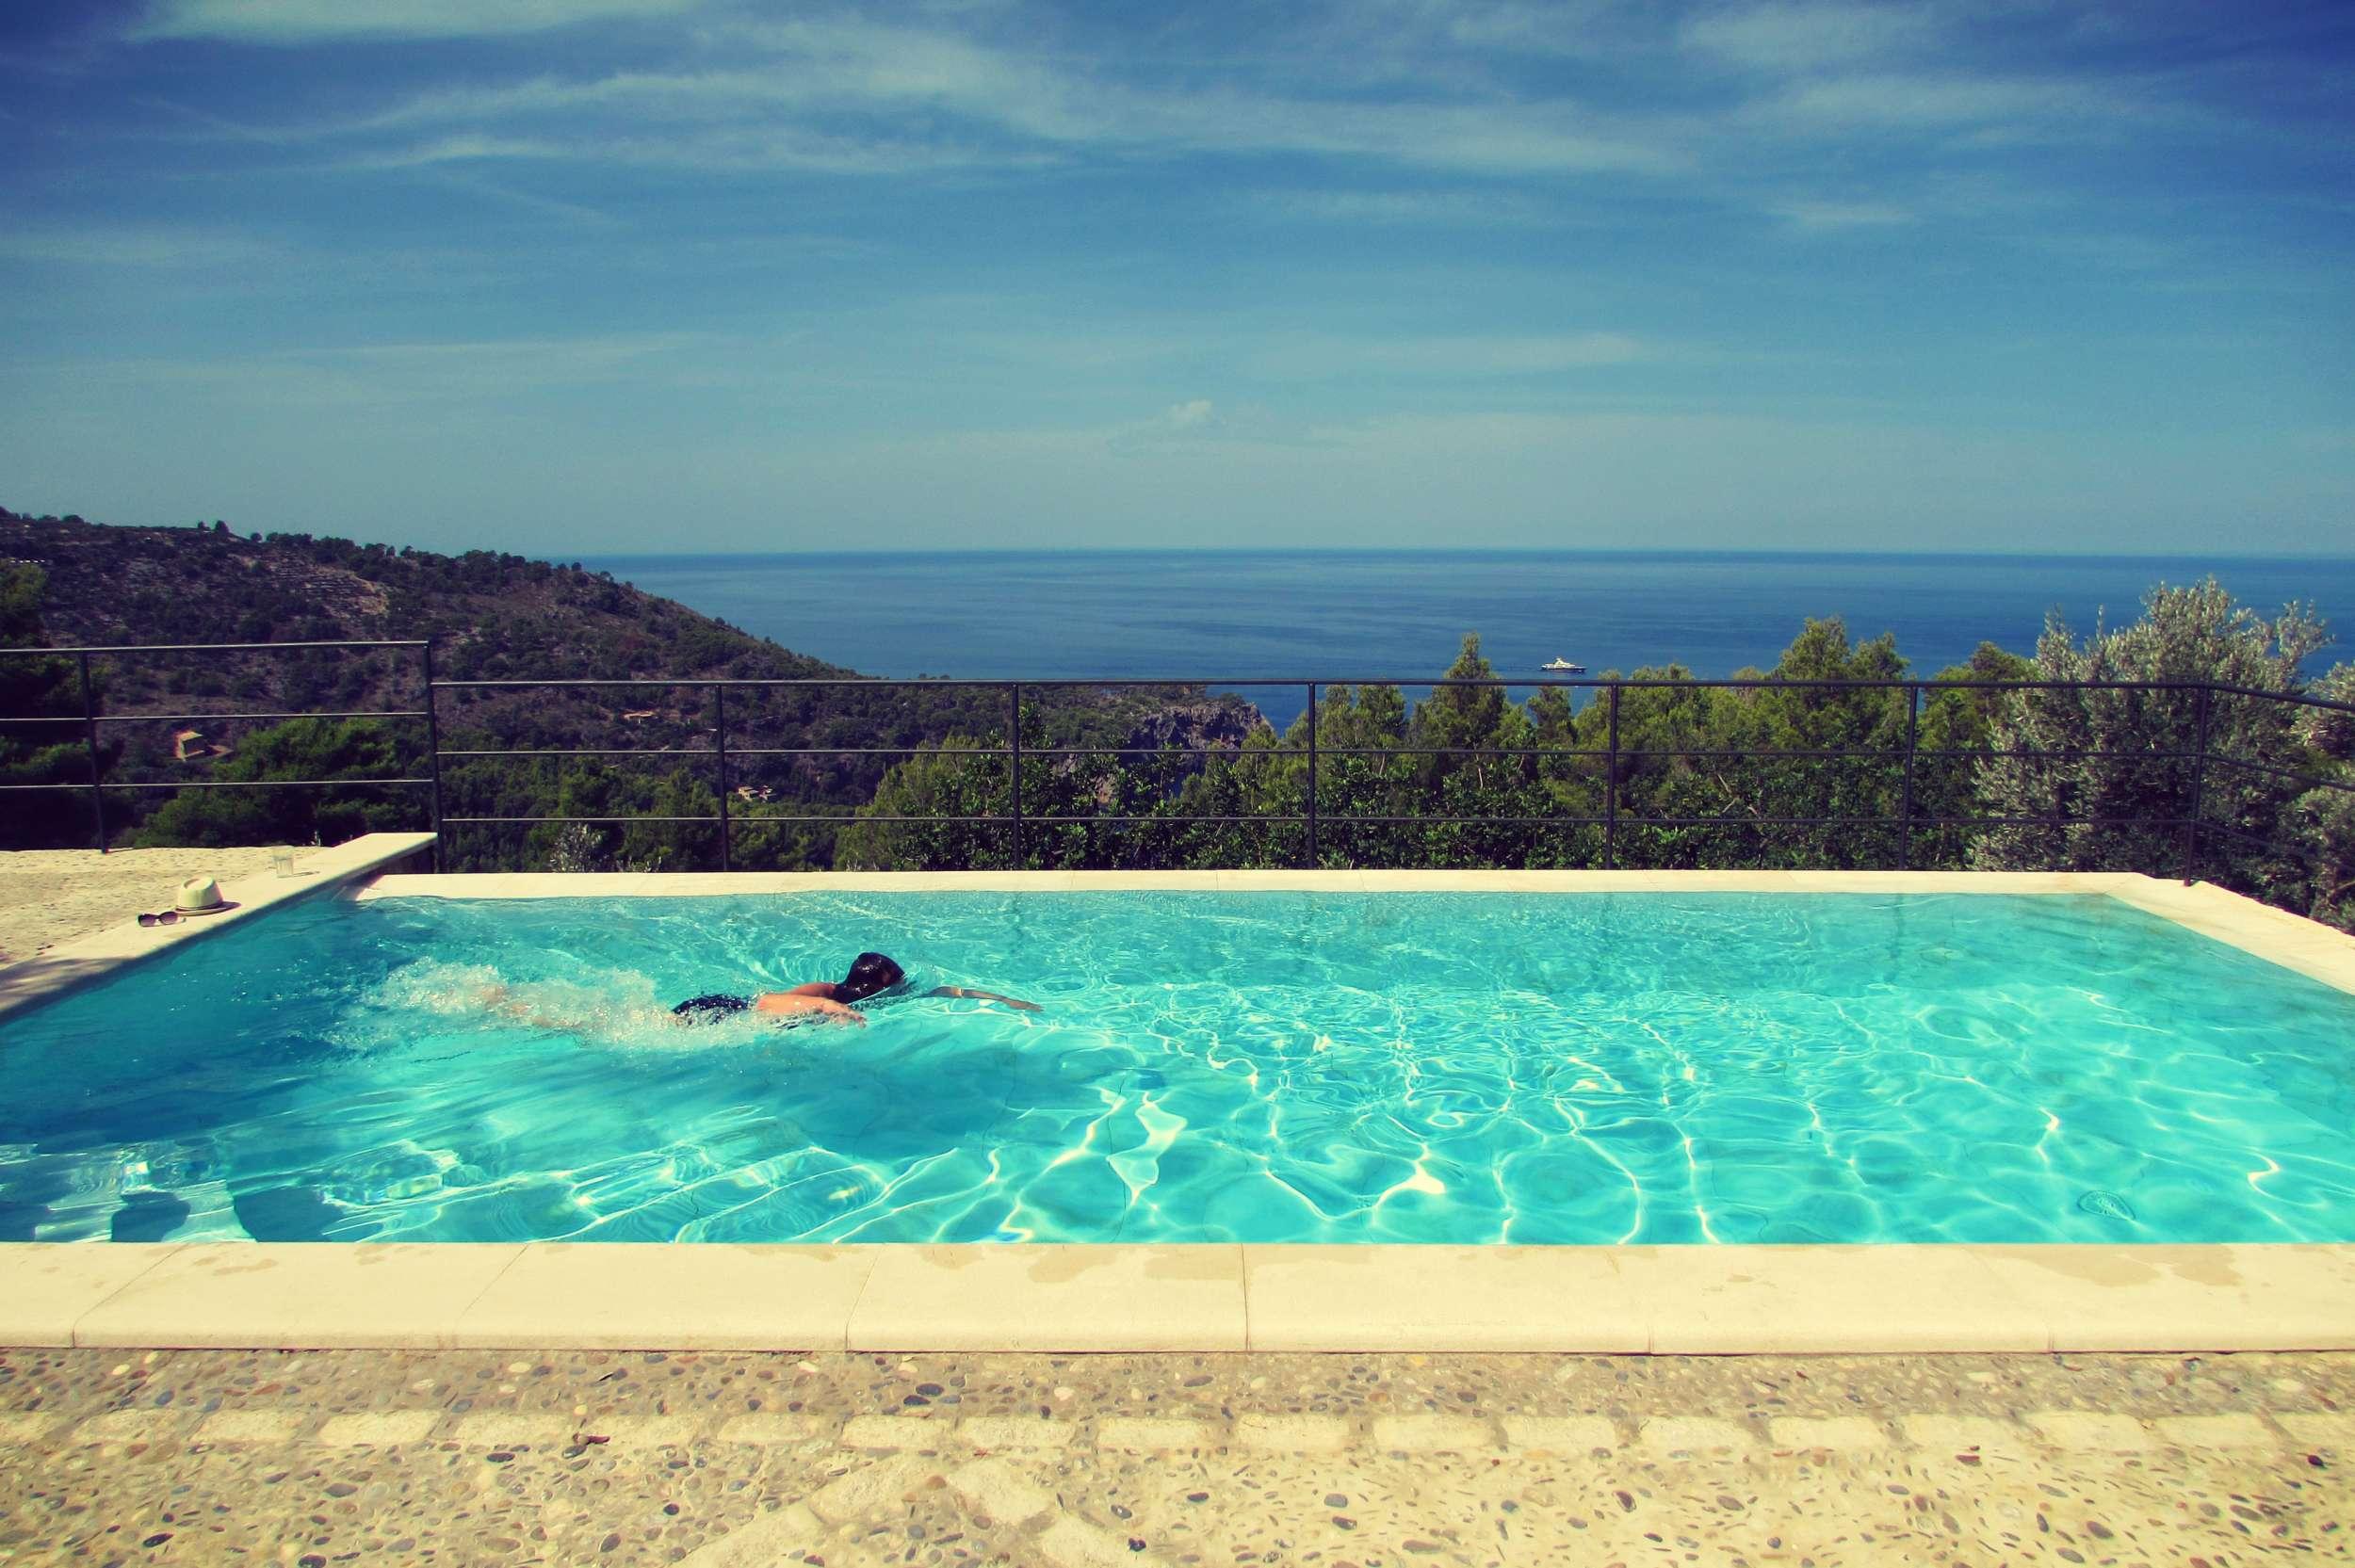 Swimming pool luxury rental villa in Deia Mallorca